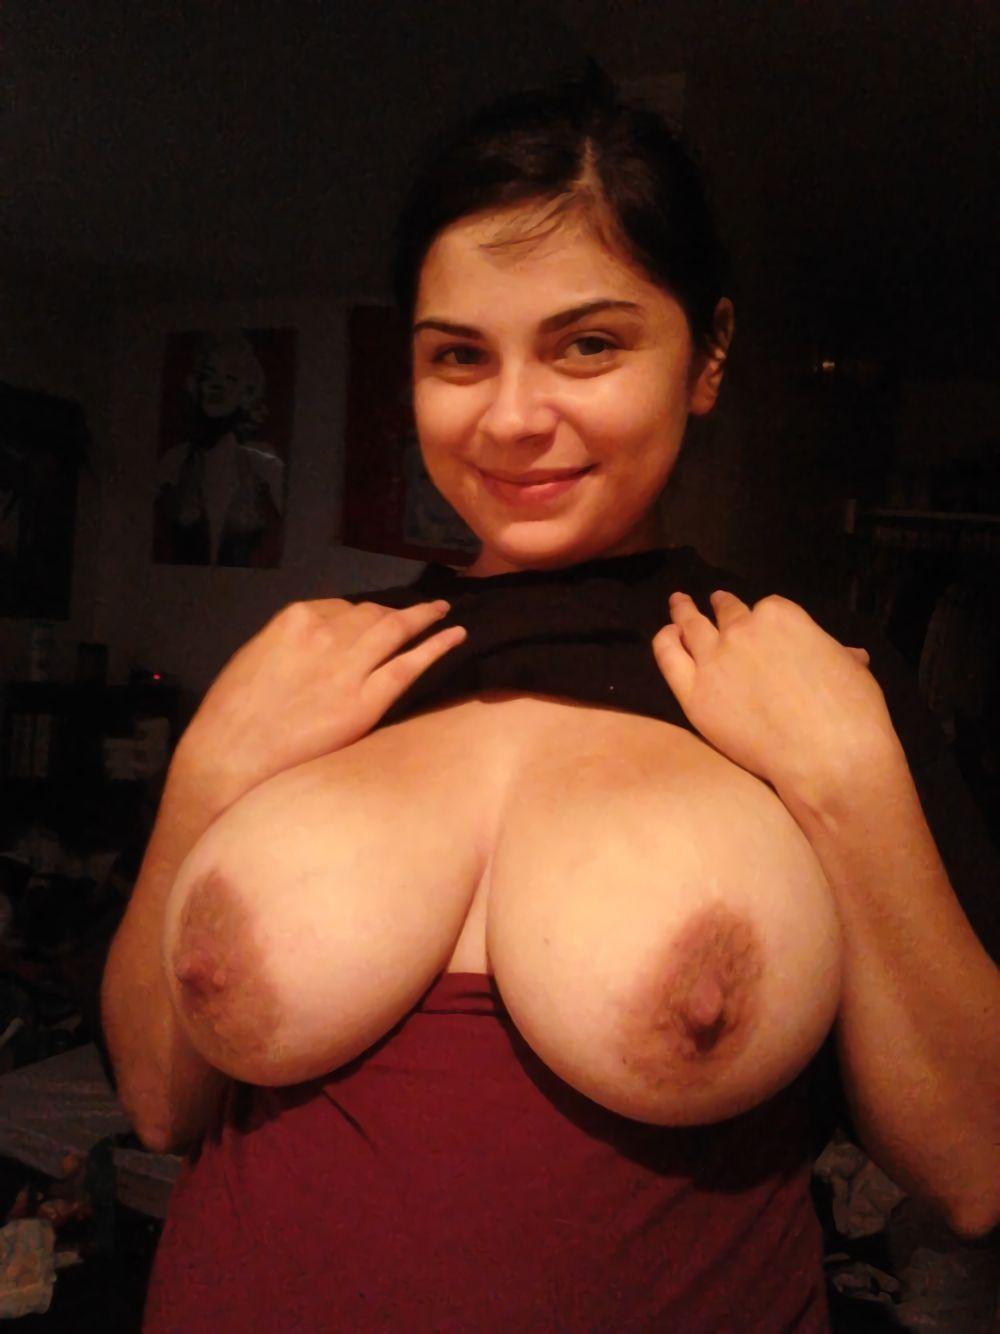 cewek barat latina pamer toket gede dan pentil mancung .Gambar bokep cewek cantik seksi punya body semok dan payudara montok